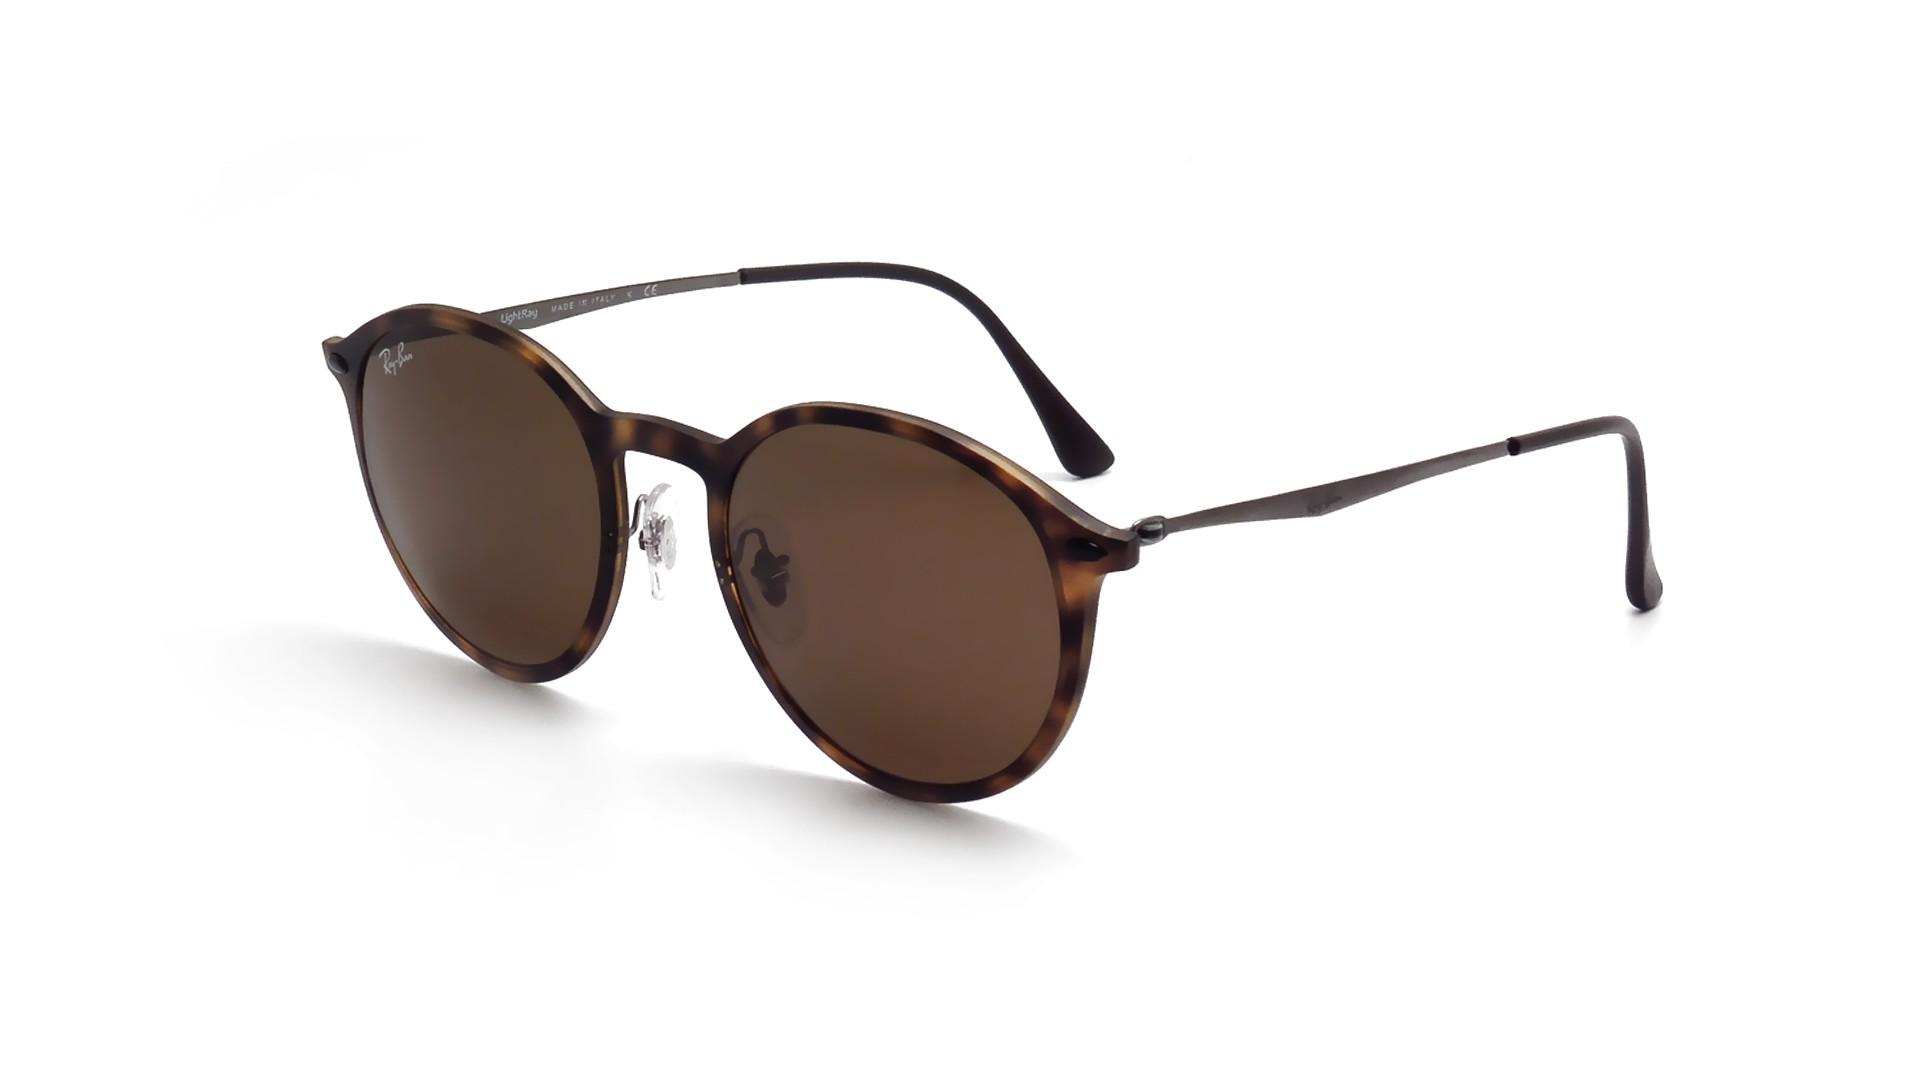 c9f35c7634 Tortoise Ray Ban Glasses Repair « Heritage Malta